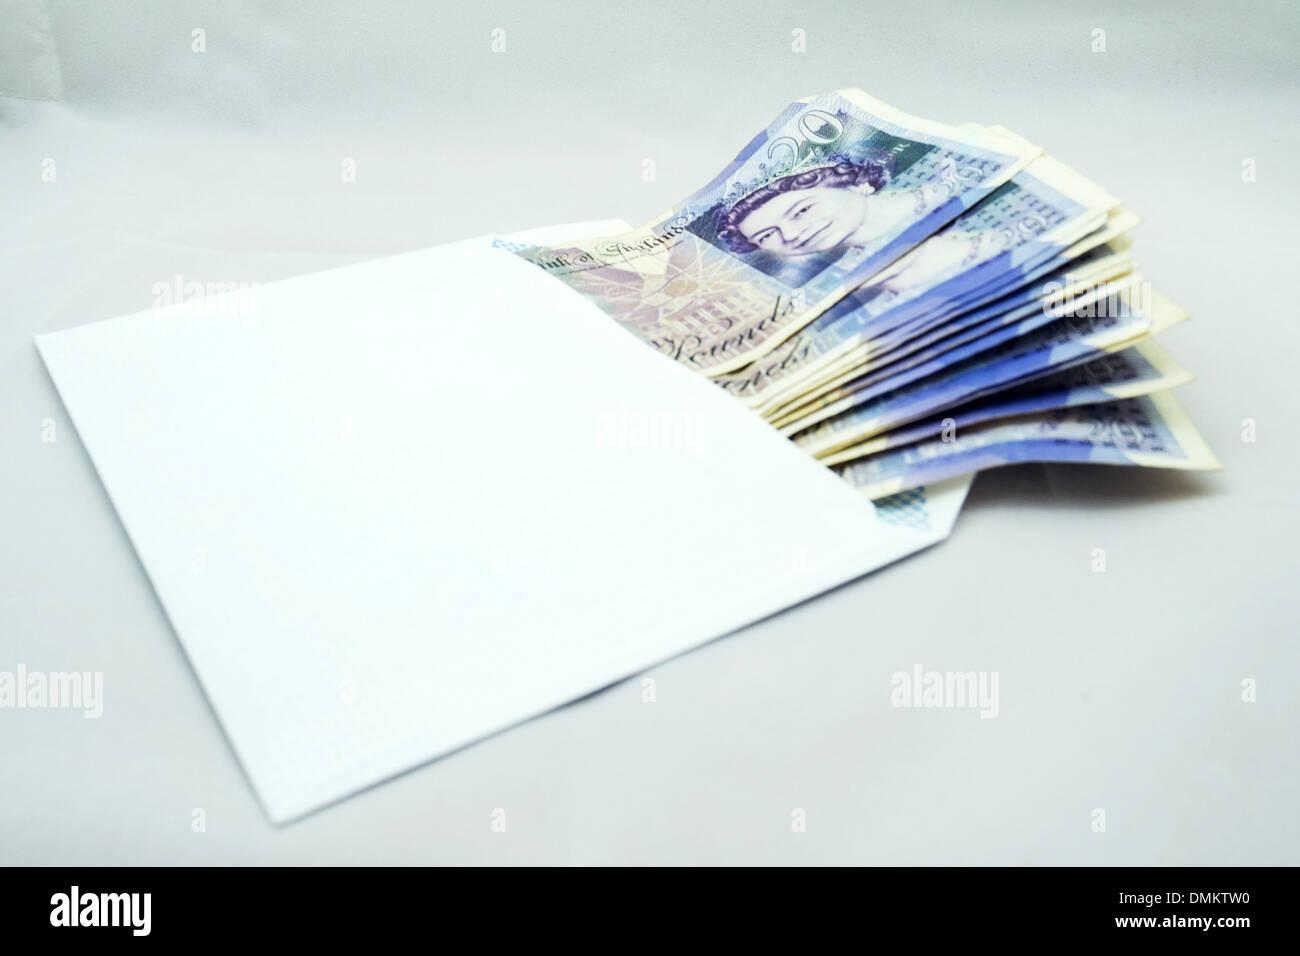 envelope money